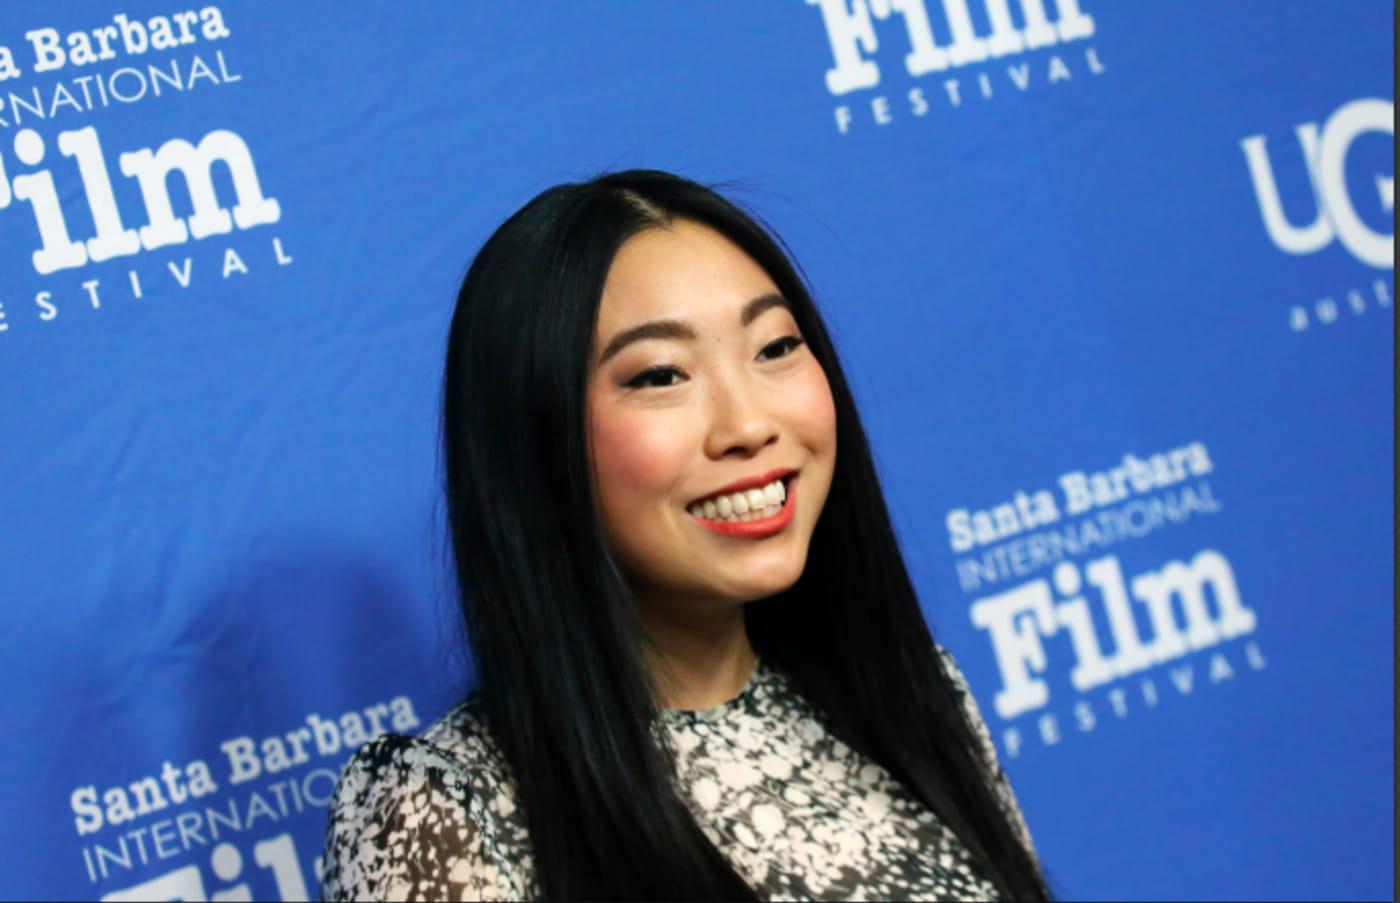 Awkwafina attends the 35th Annual Santa Barbara International Film Festival